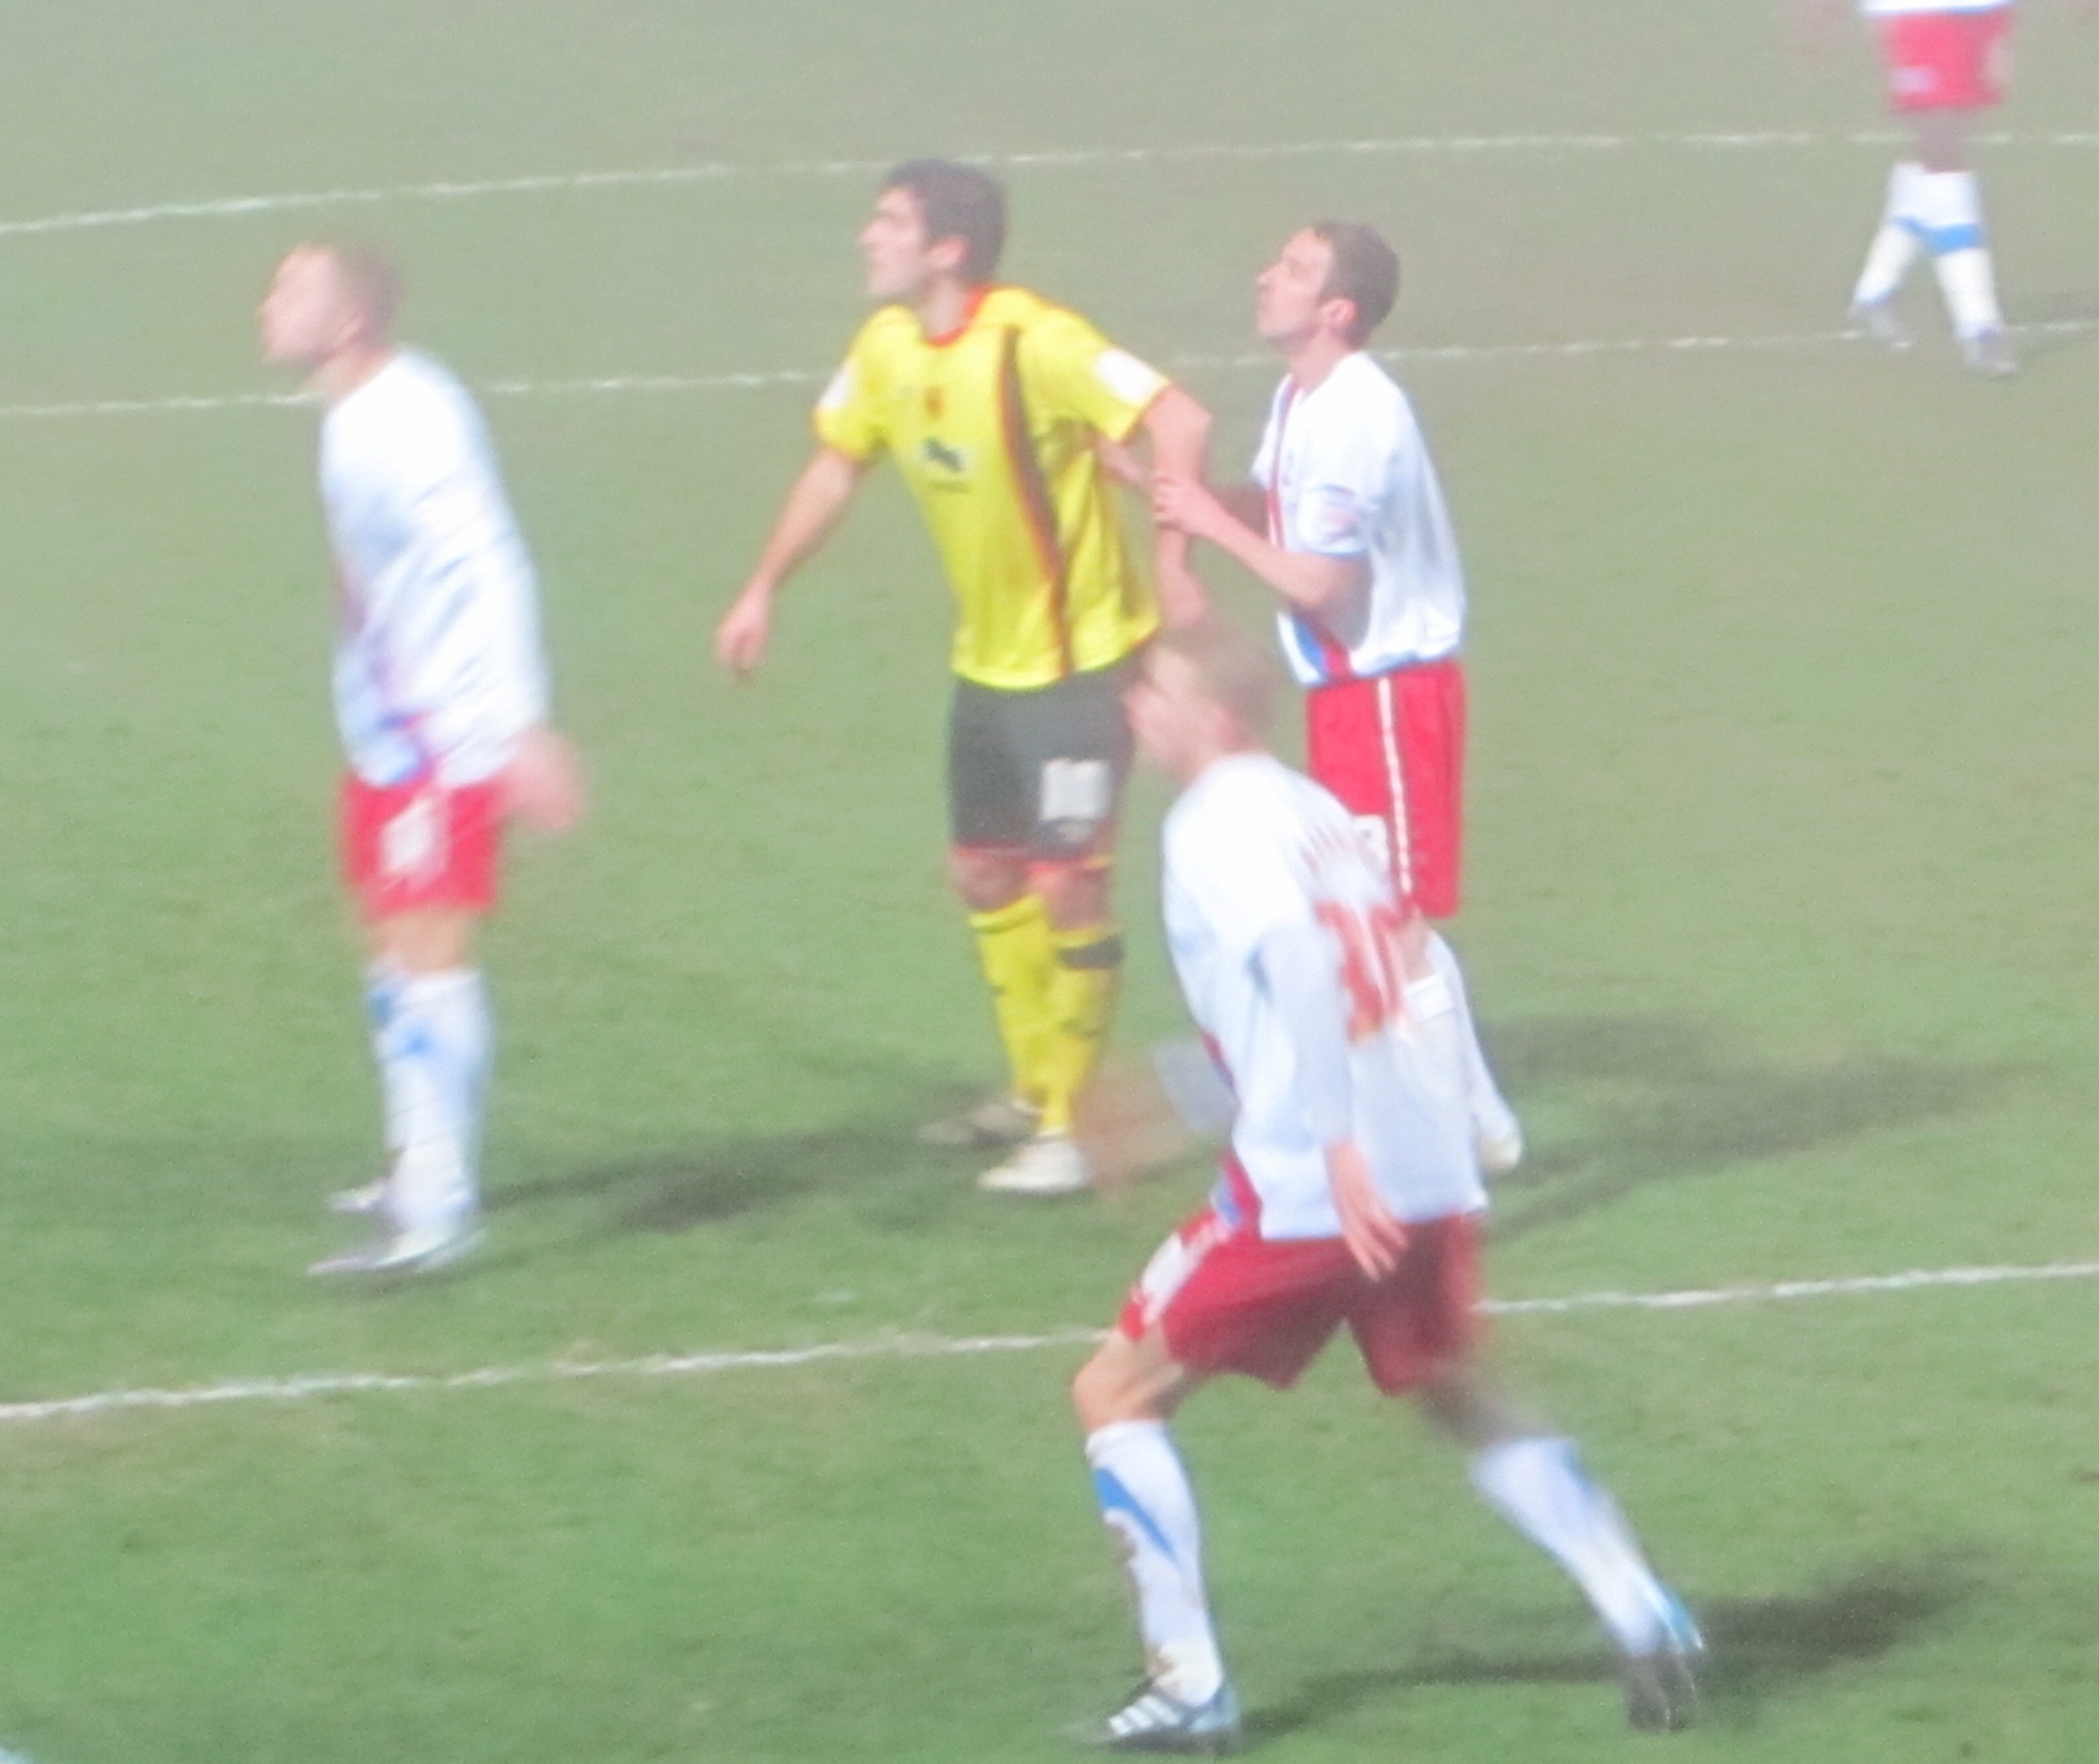 Danny Graham (footballer)